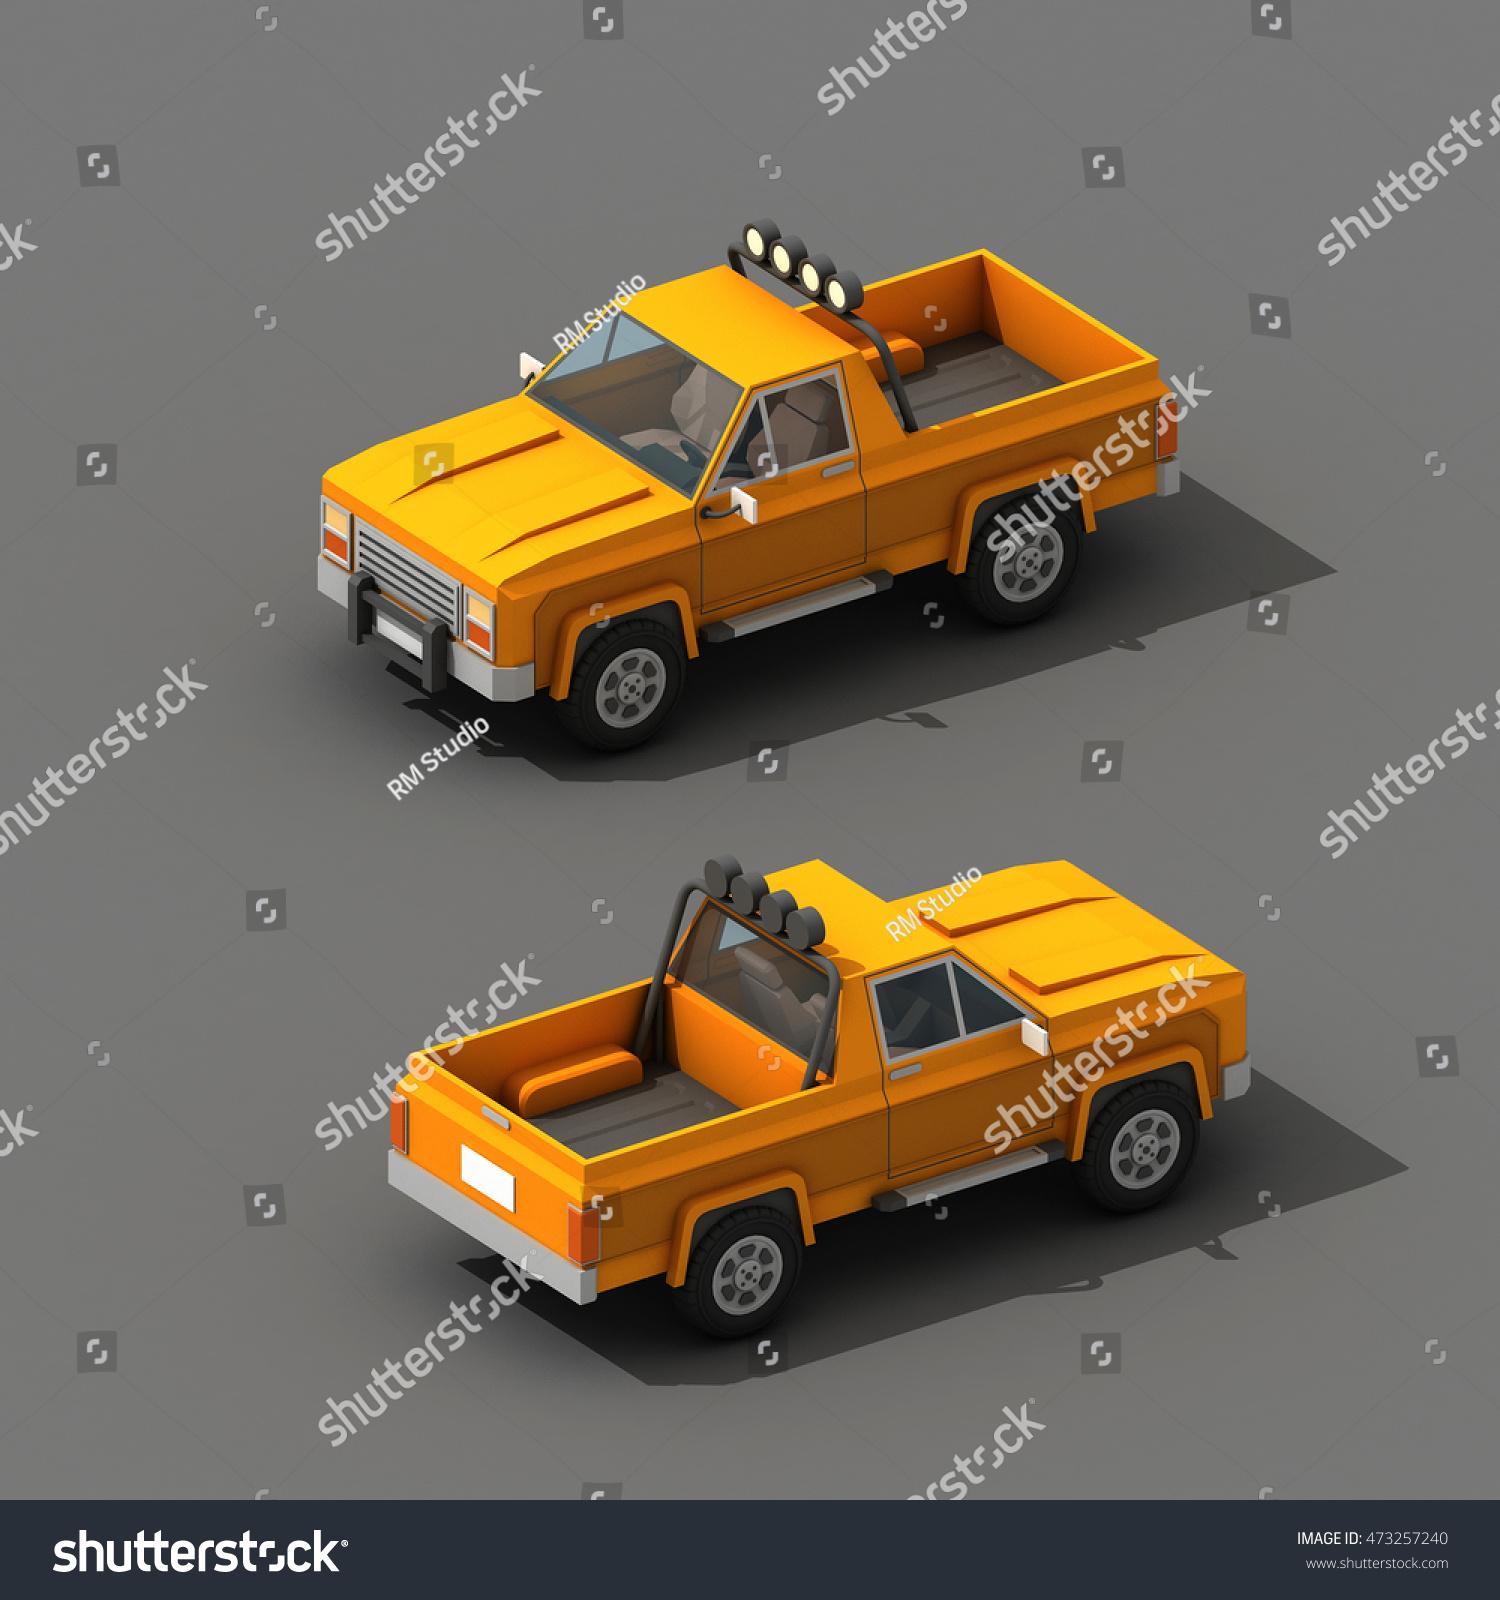 Cartoon Low Polygon Car 3 D Rendering Stock Illustration